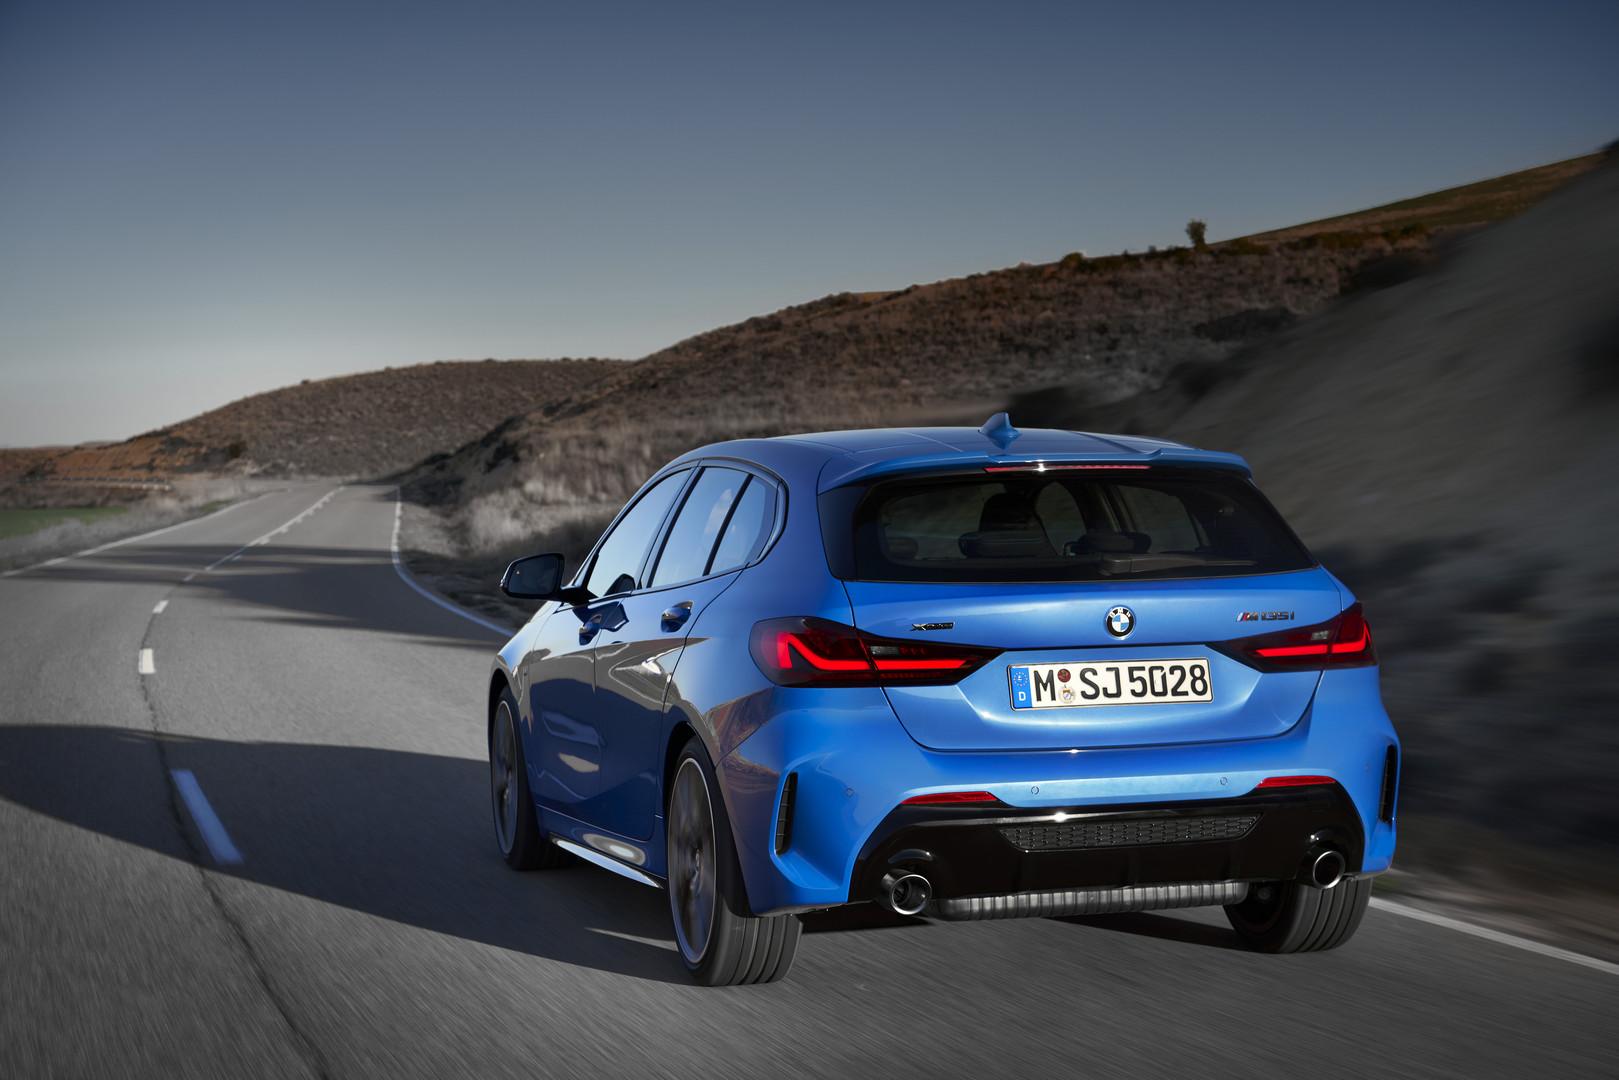 2020 BMW M135i Rear Lights